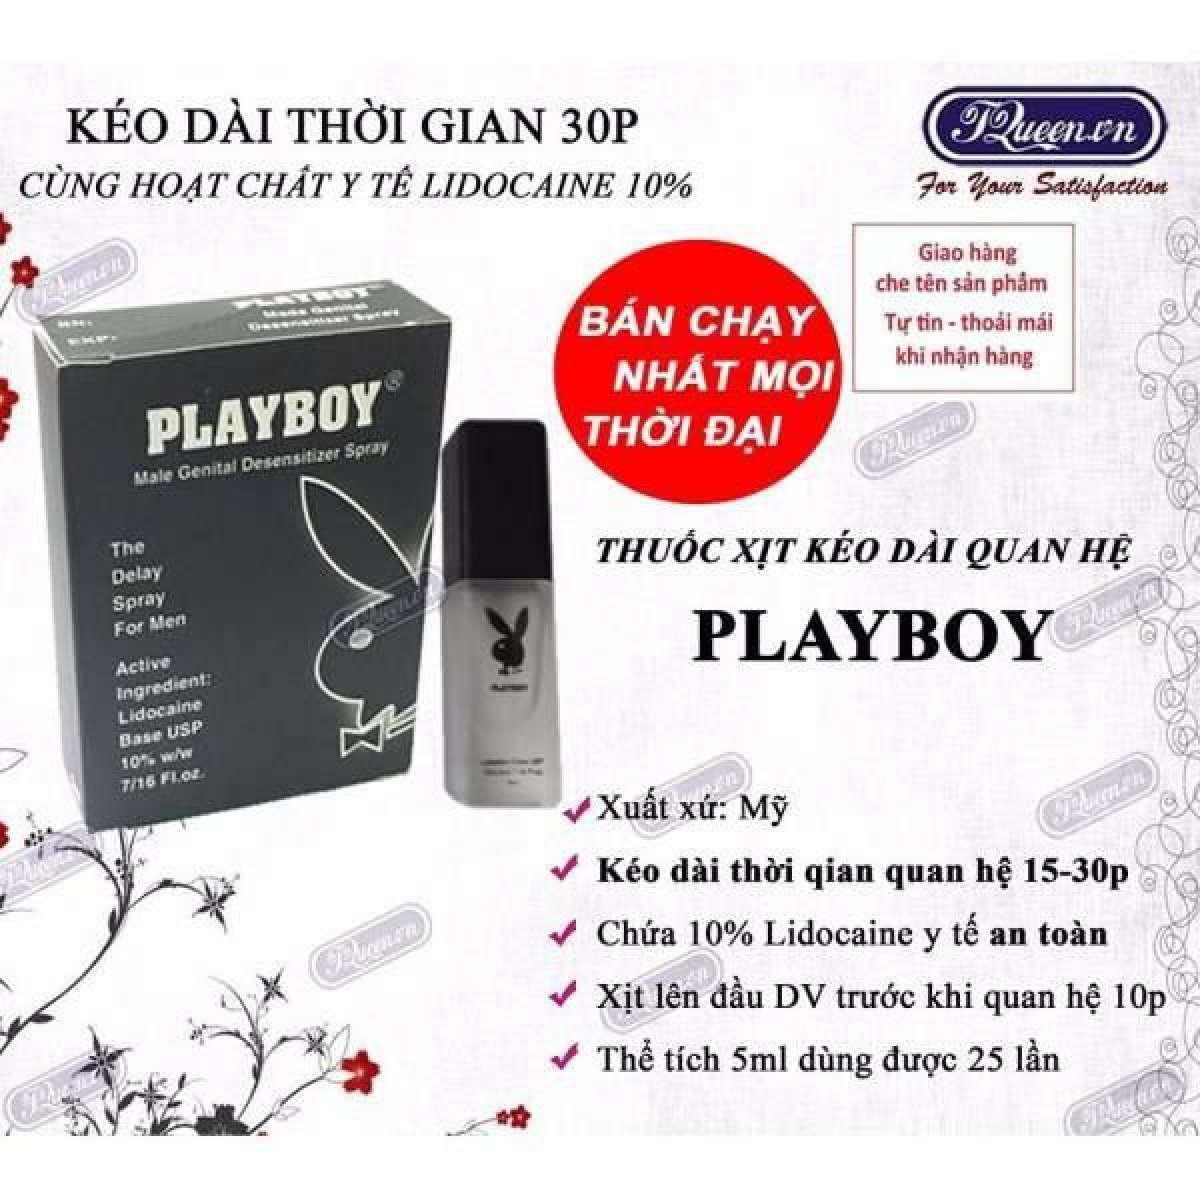 chai-xit-playboy-keo-dai-quan-he-1